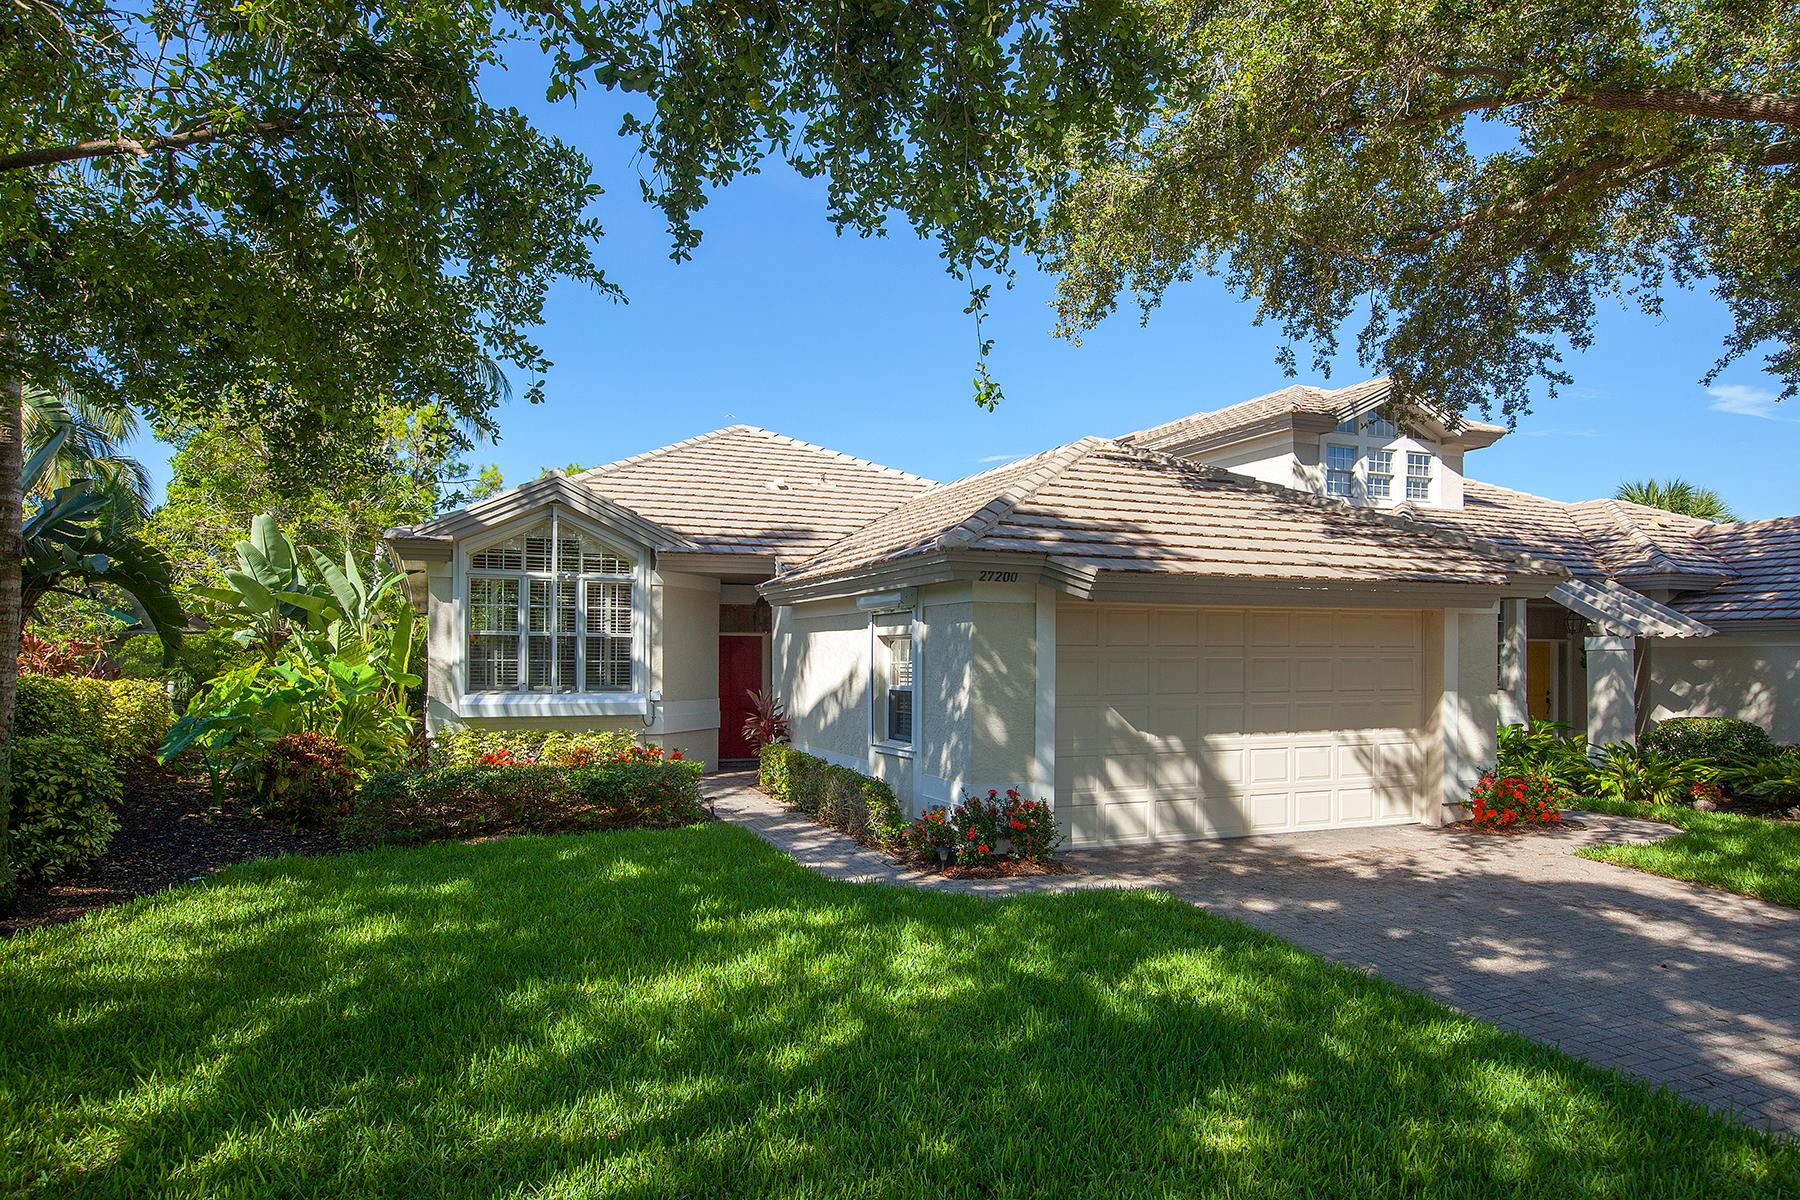 Casa para uma família para Venda às ENCLAVE AT BONITA BAY 27200 Enclave Dr Bonita Springs, Florida, 34134 Estados Unidos